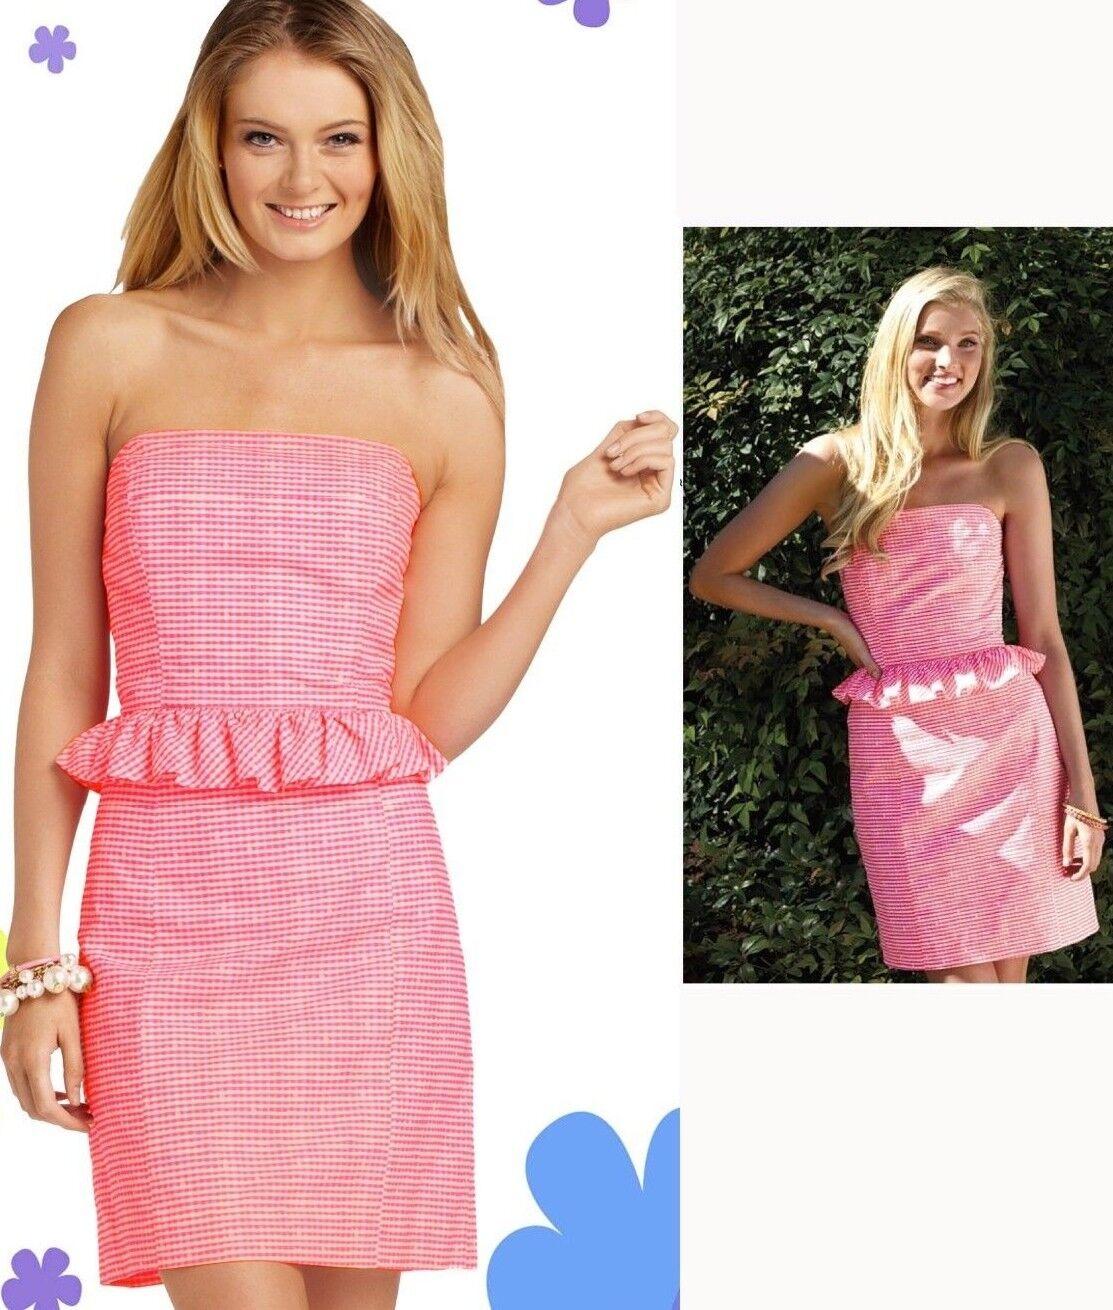 188 Lilly Pulitzer Lowe Fiesta Pink Pretty Gingham Strapless Peplum Dress